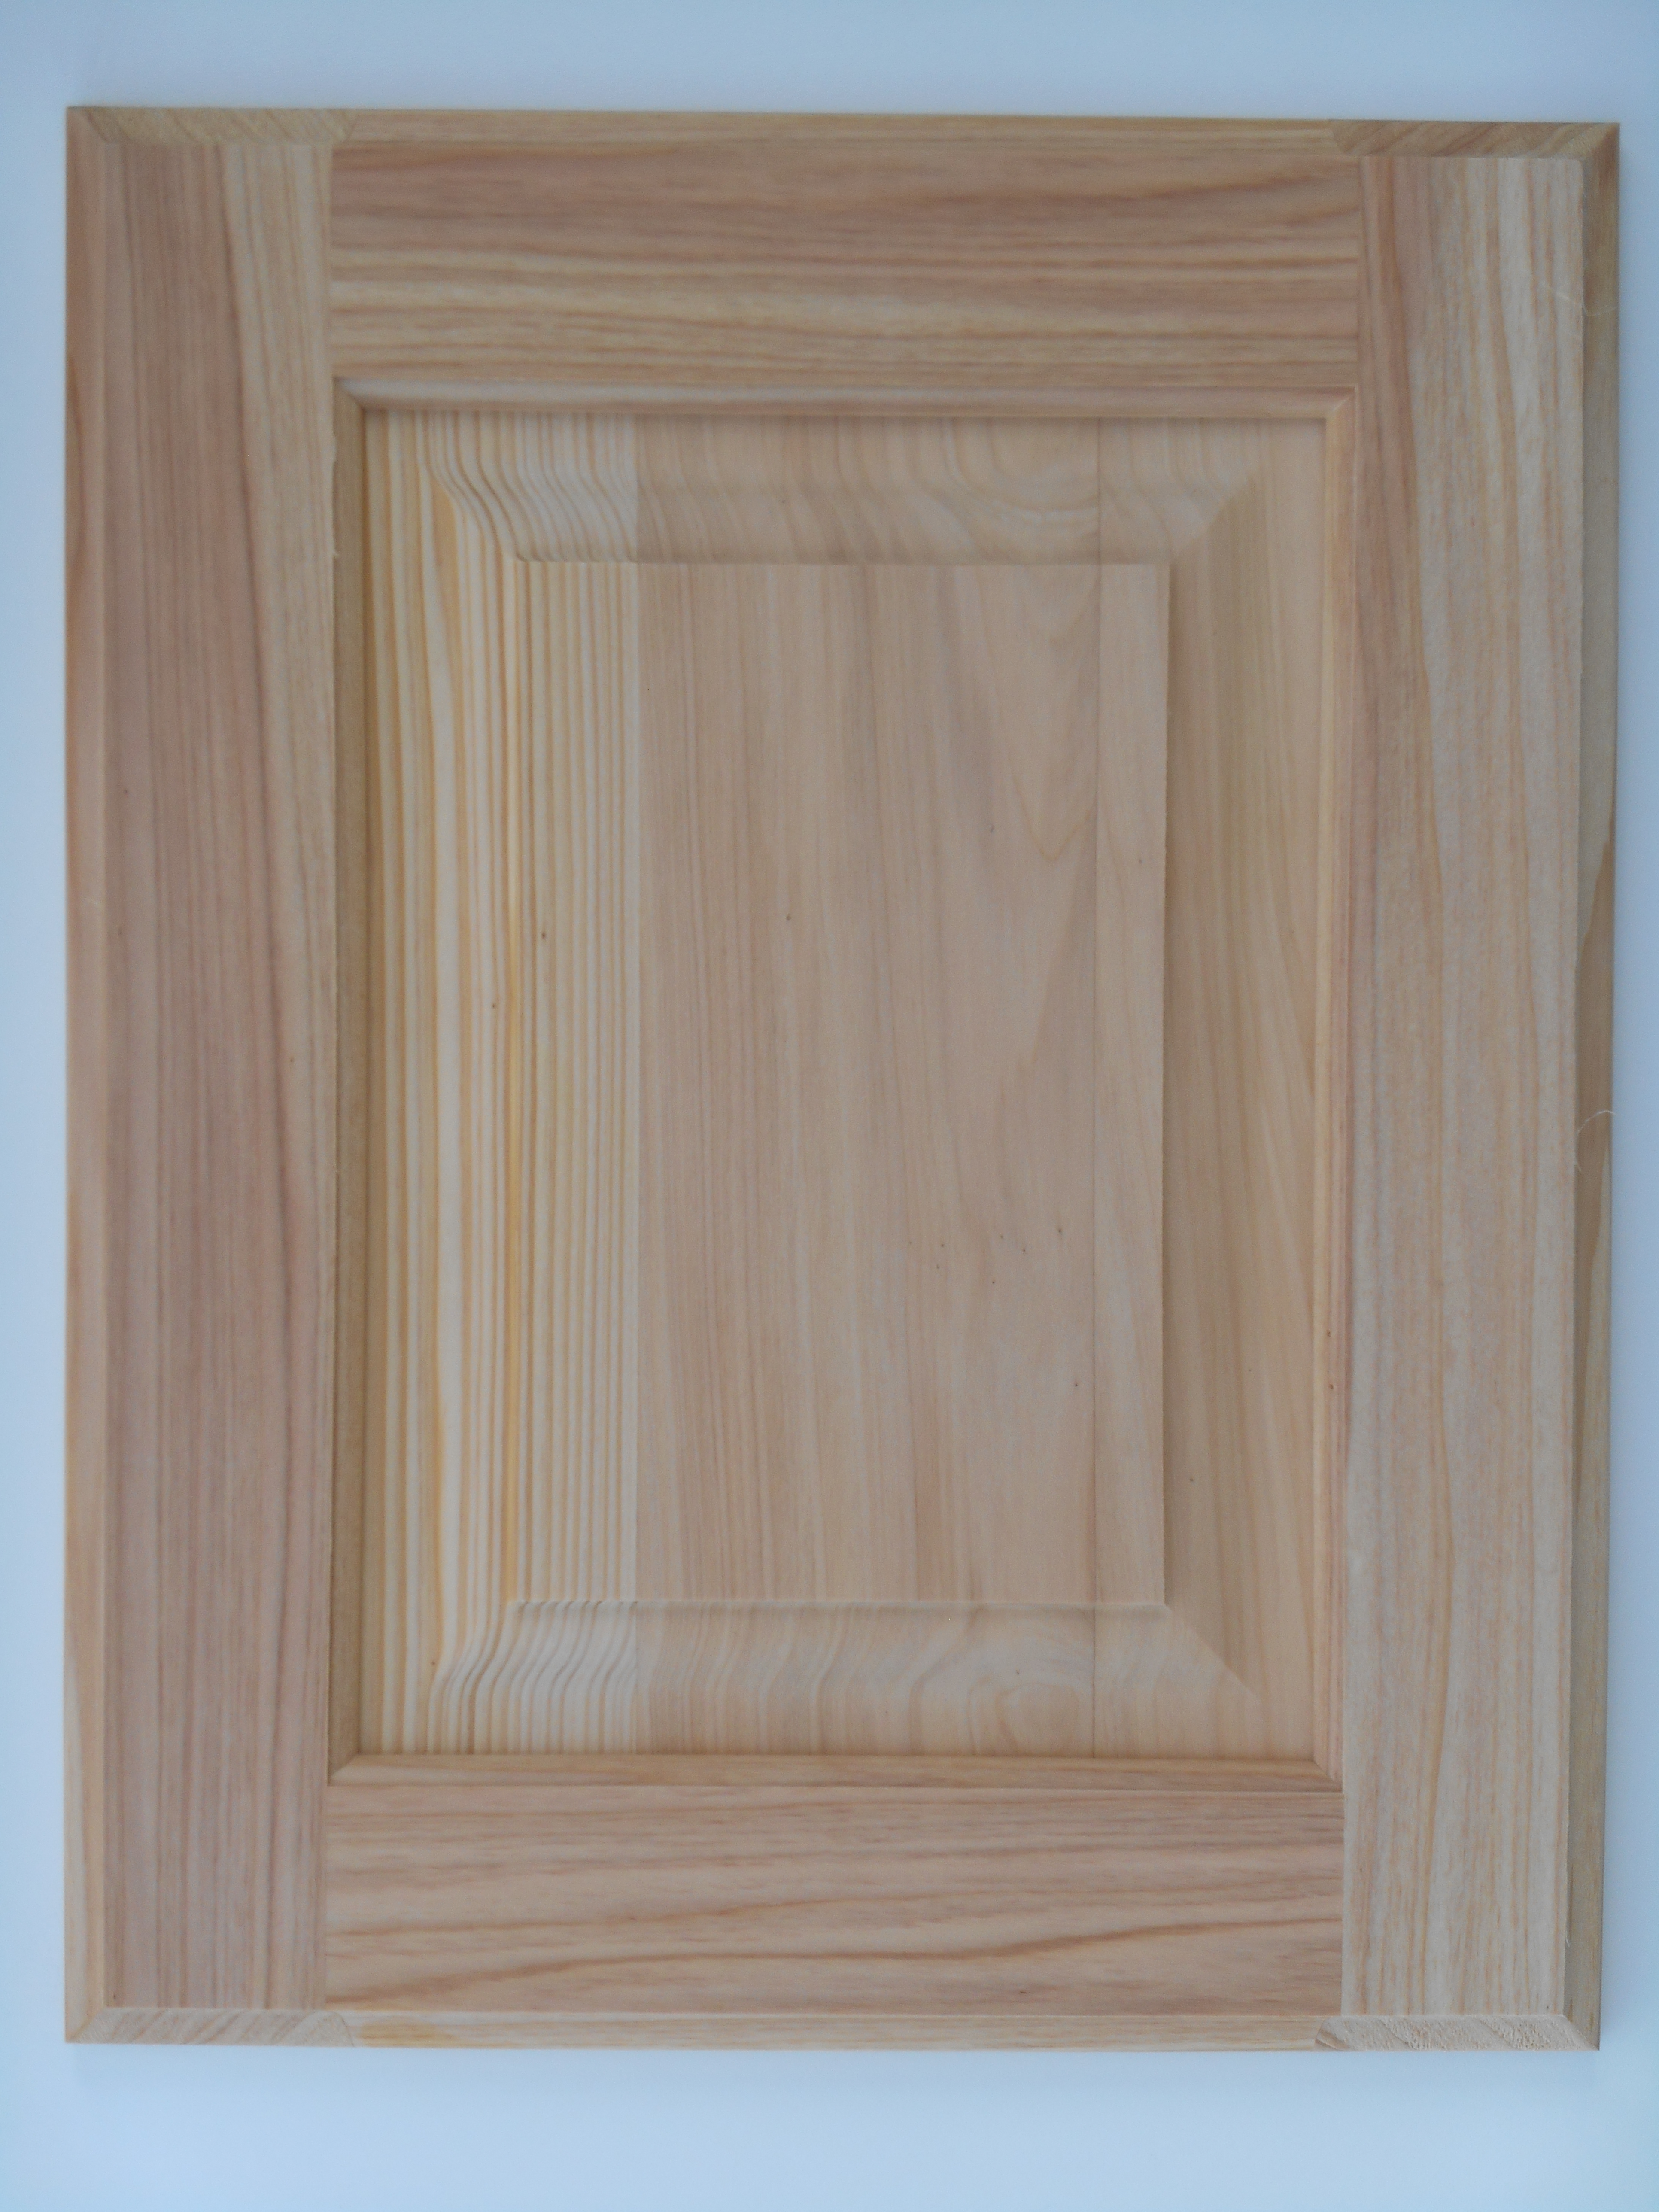 raised panel wood doors ideas, design, pics & examples